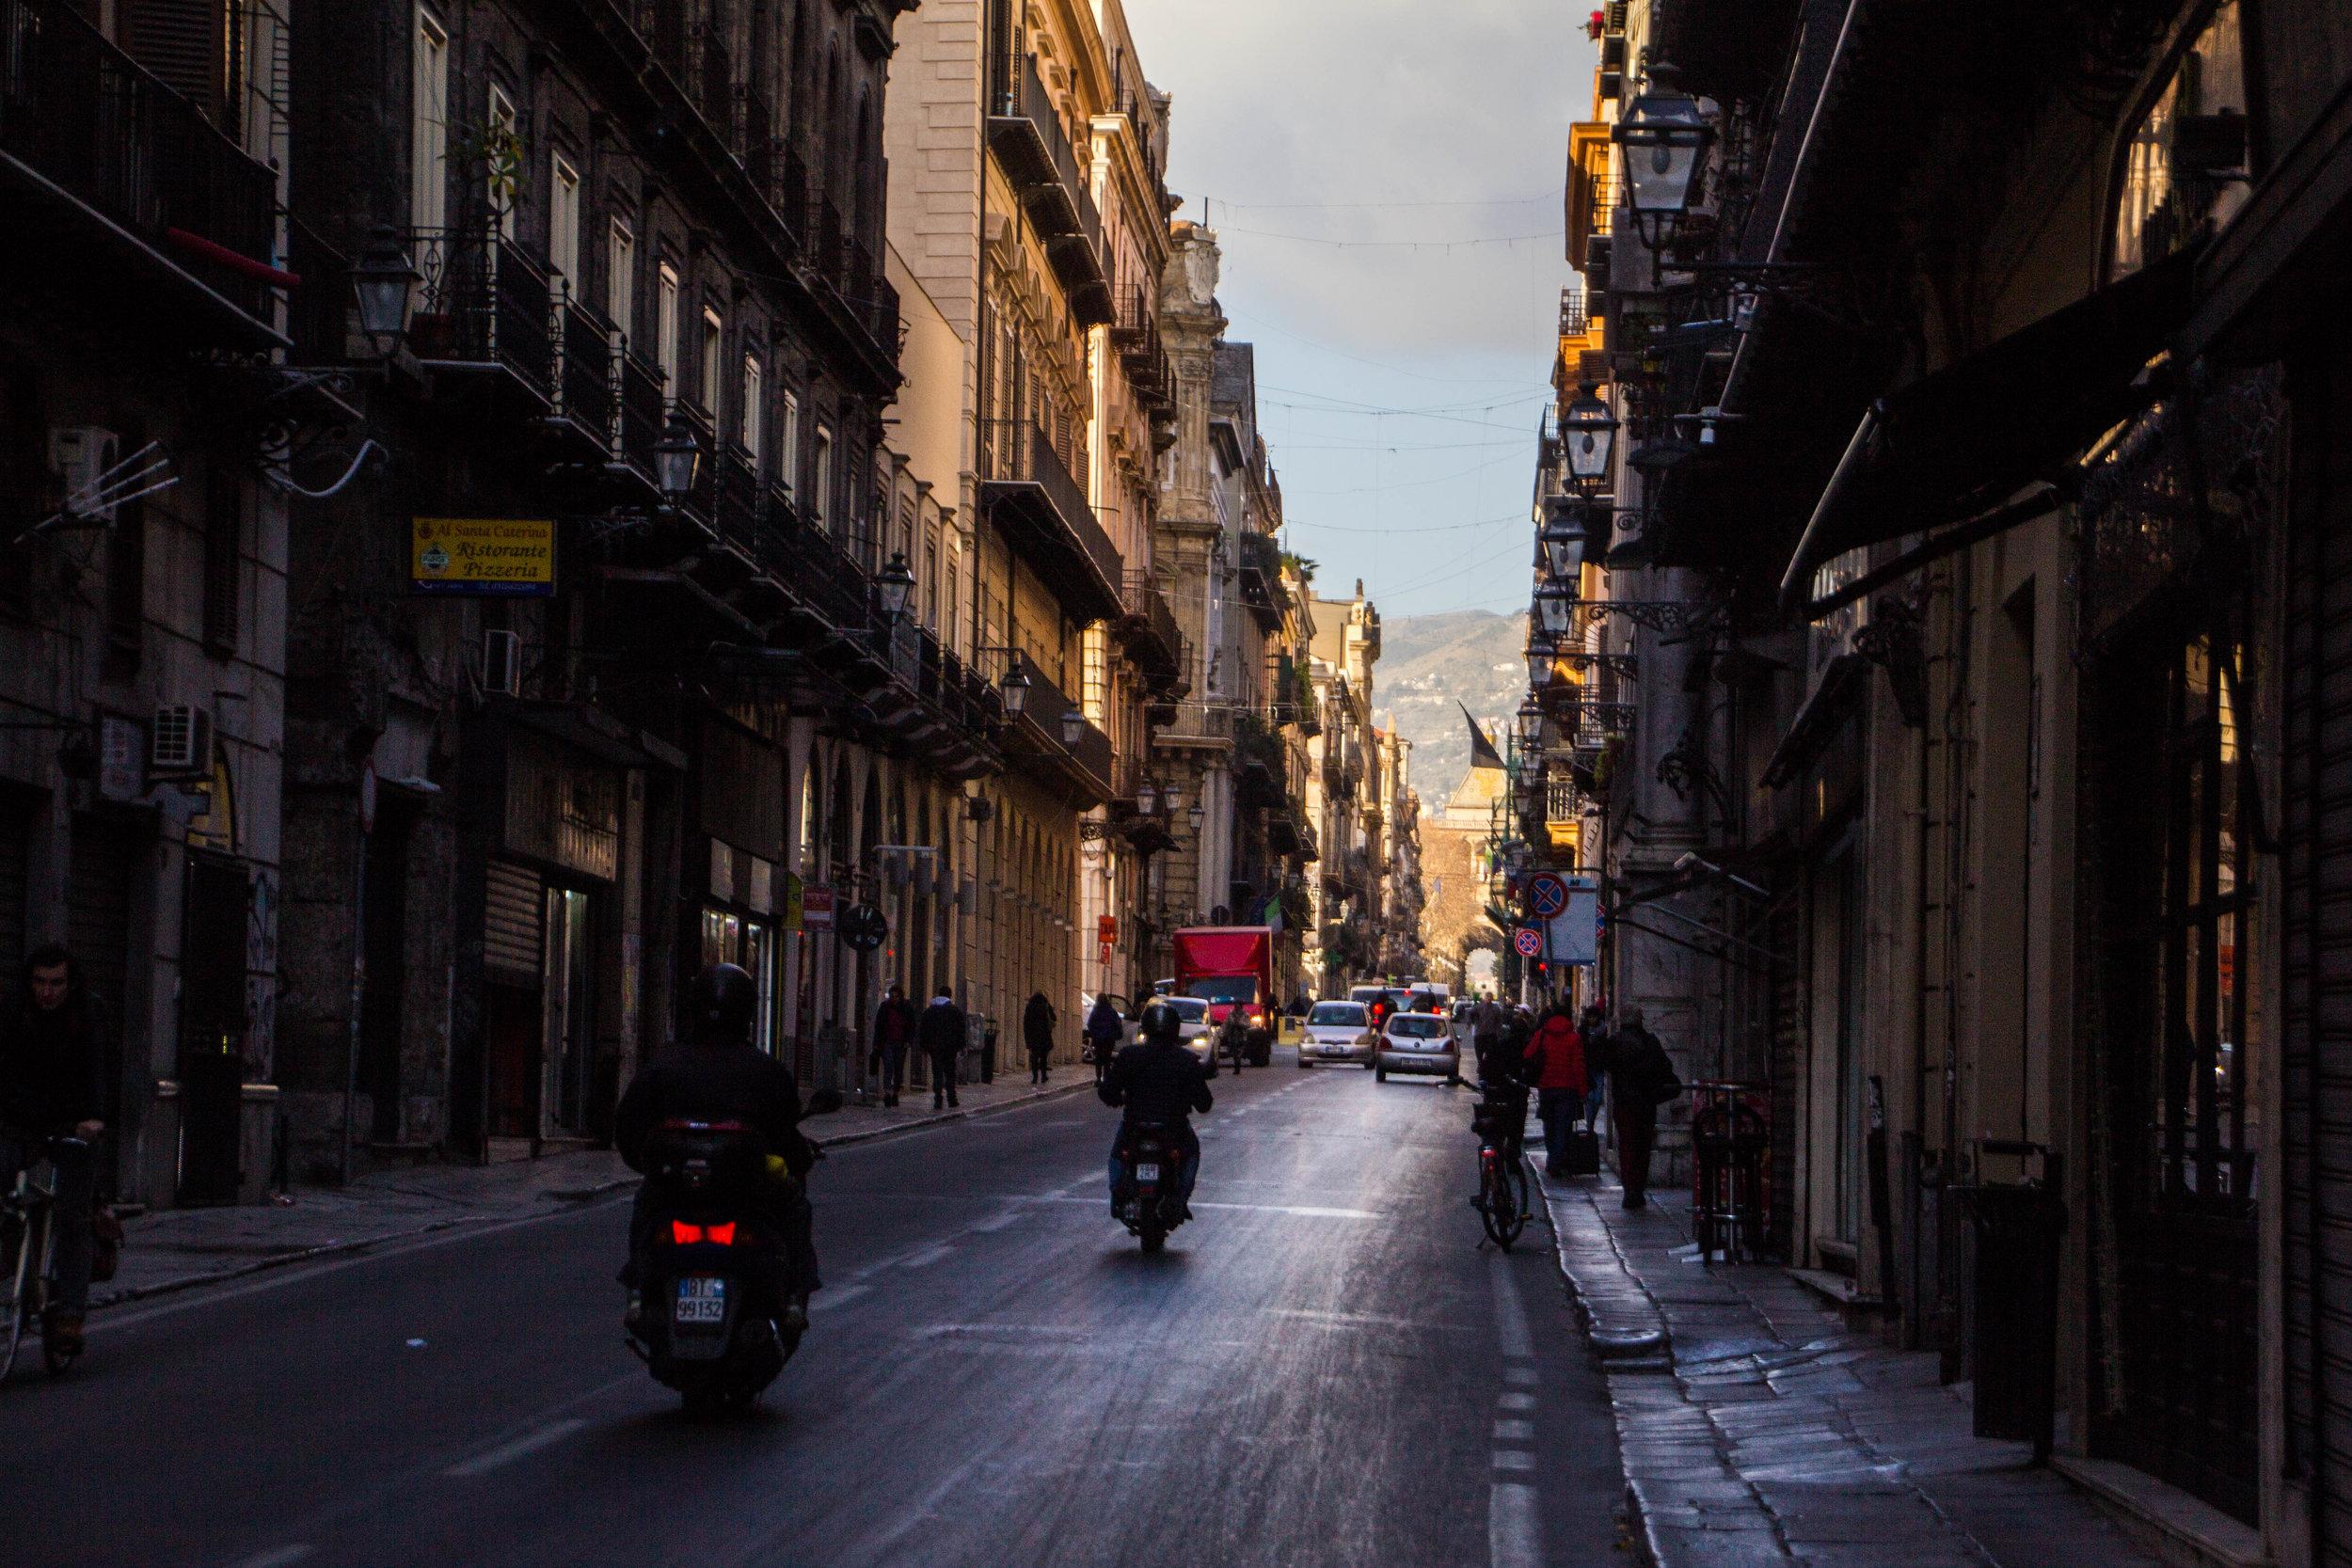 street-photography-palermo-sicily-9.jpg